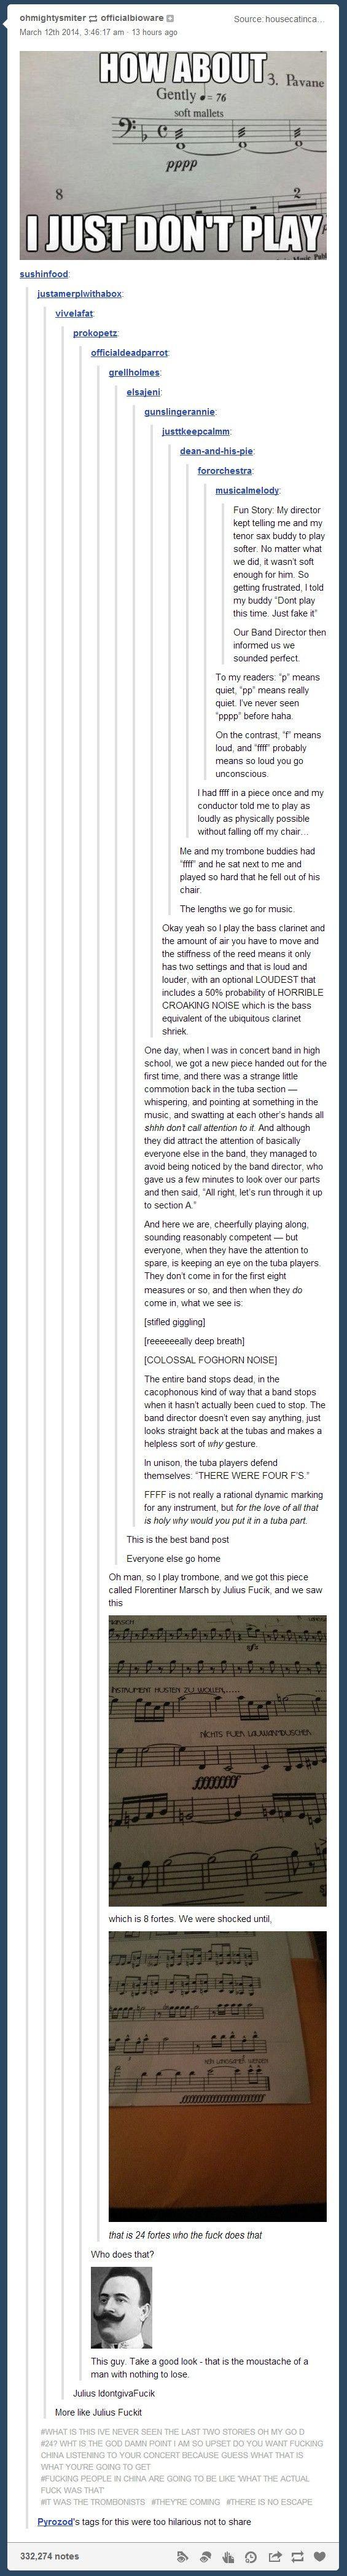 Music volume humor